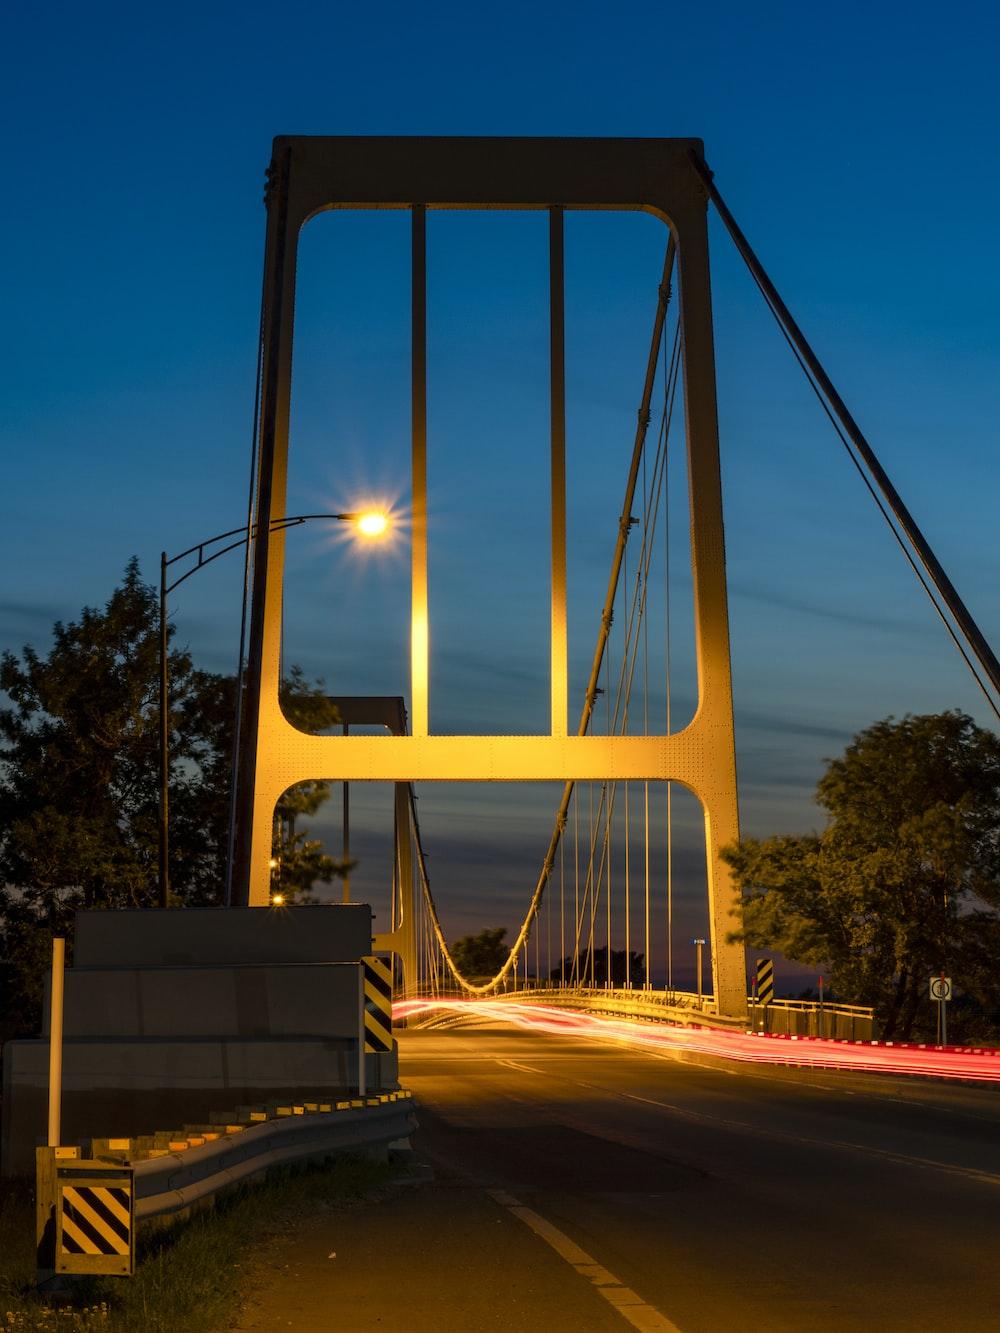 gray bridge during nighttime